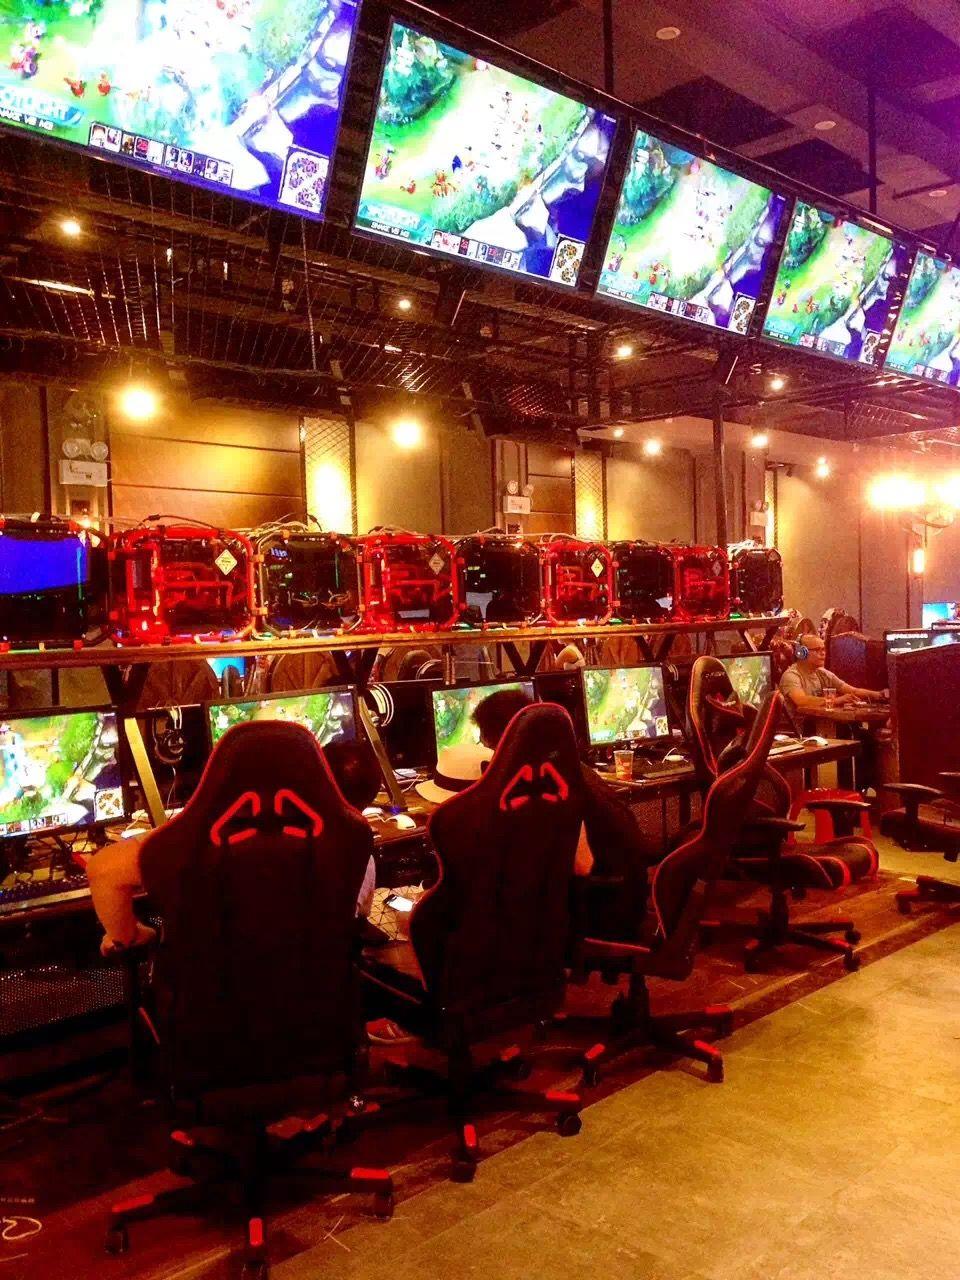 Internet Cafe Cyber Cafe Cyber Cafe Interior Game Cafe